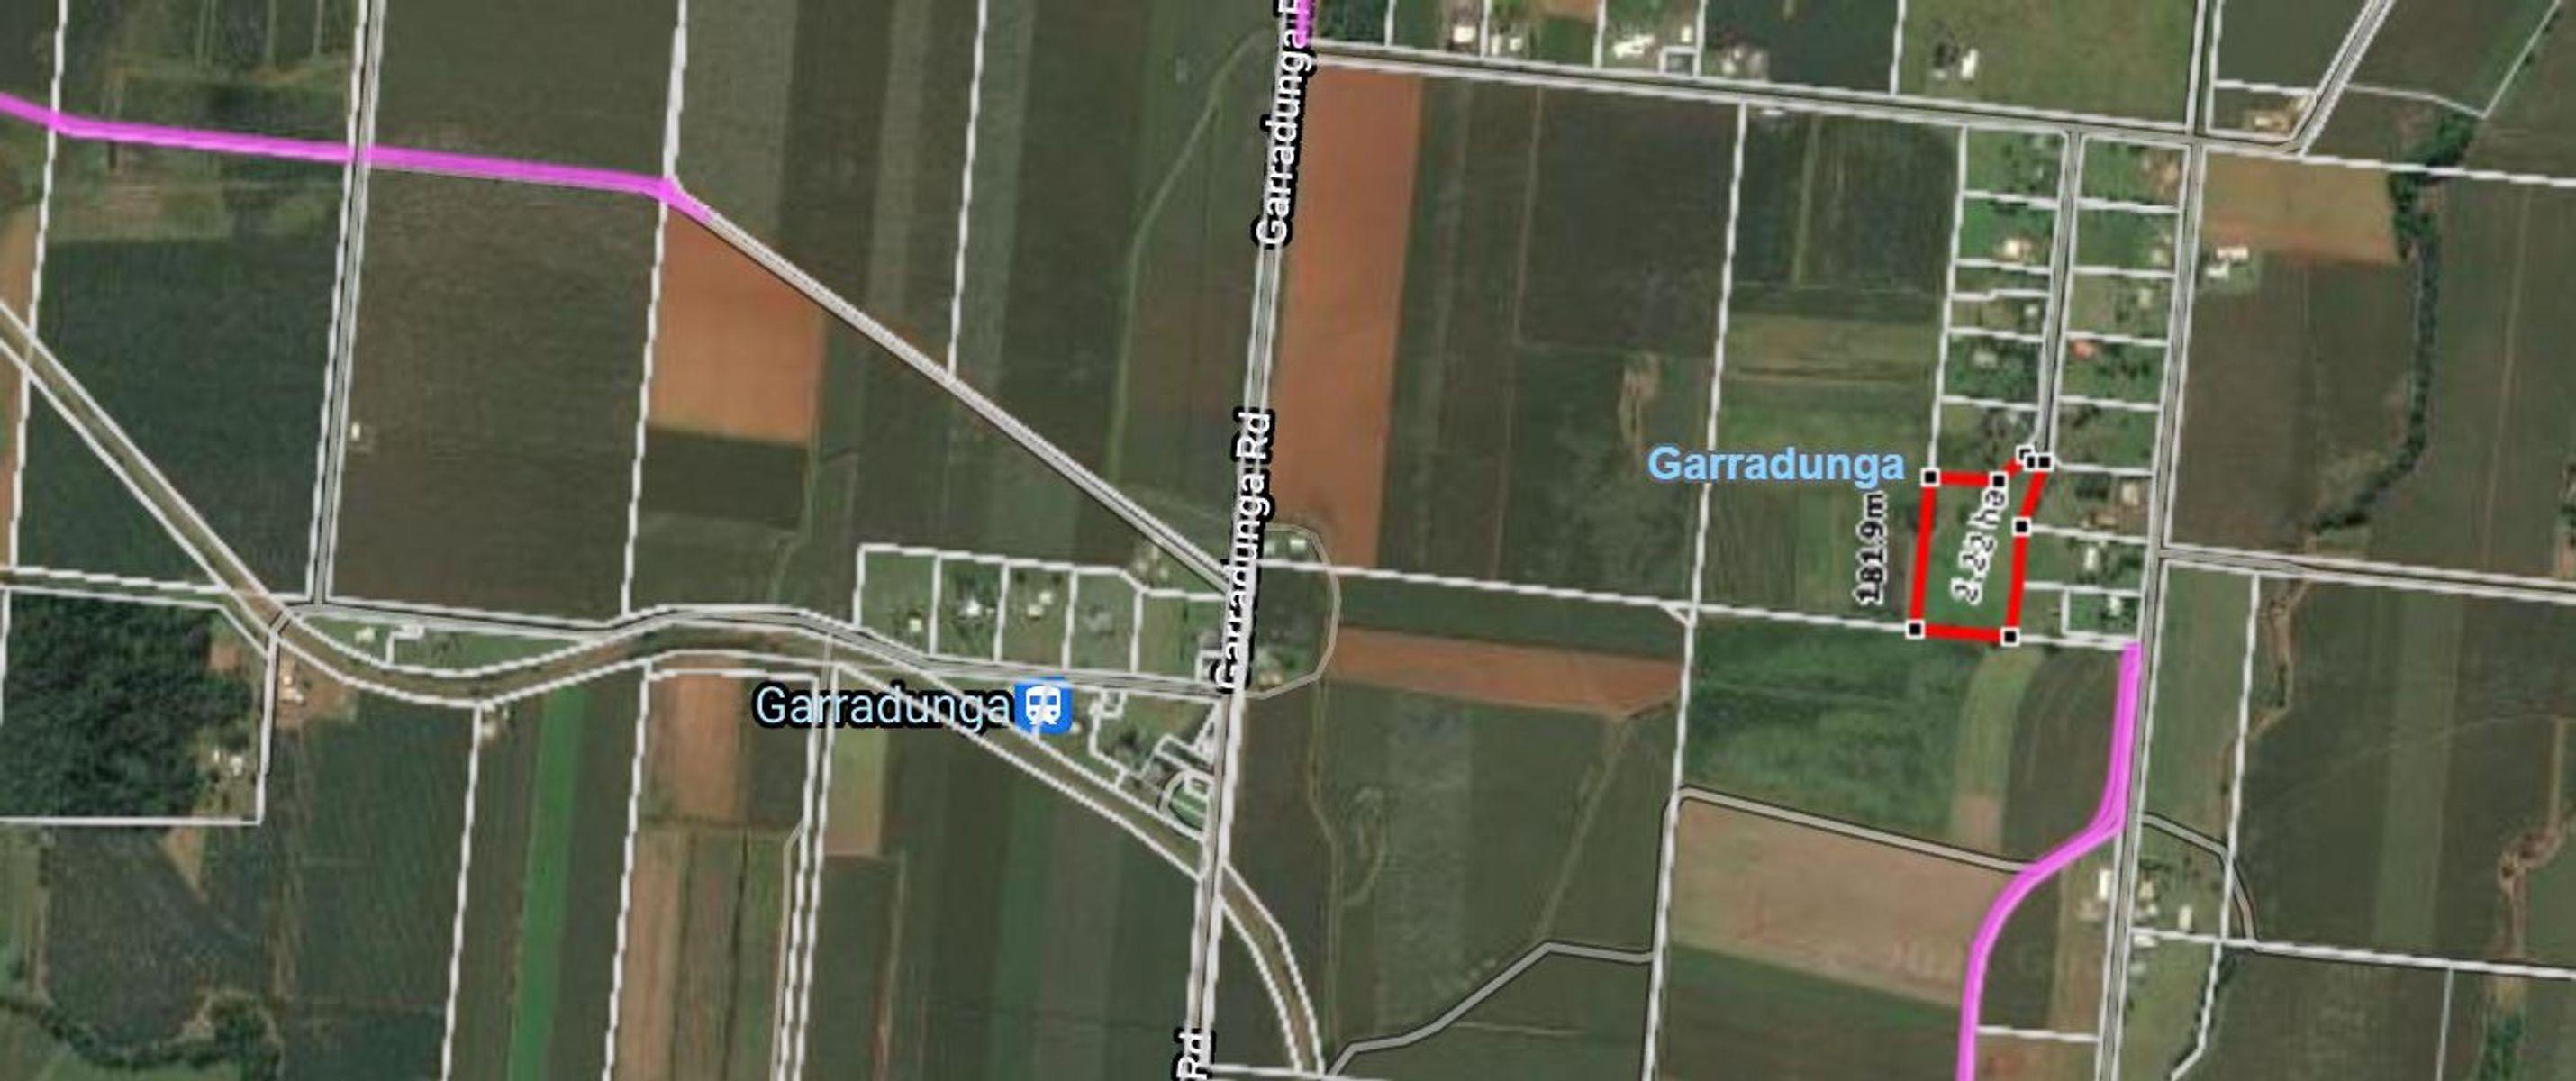 12 Brischetto Drive, Garradunga, QLD 4860